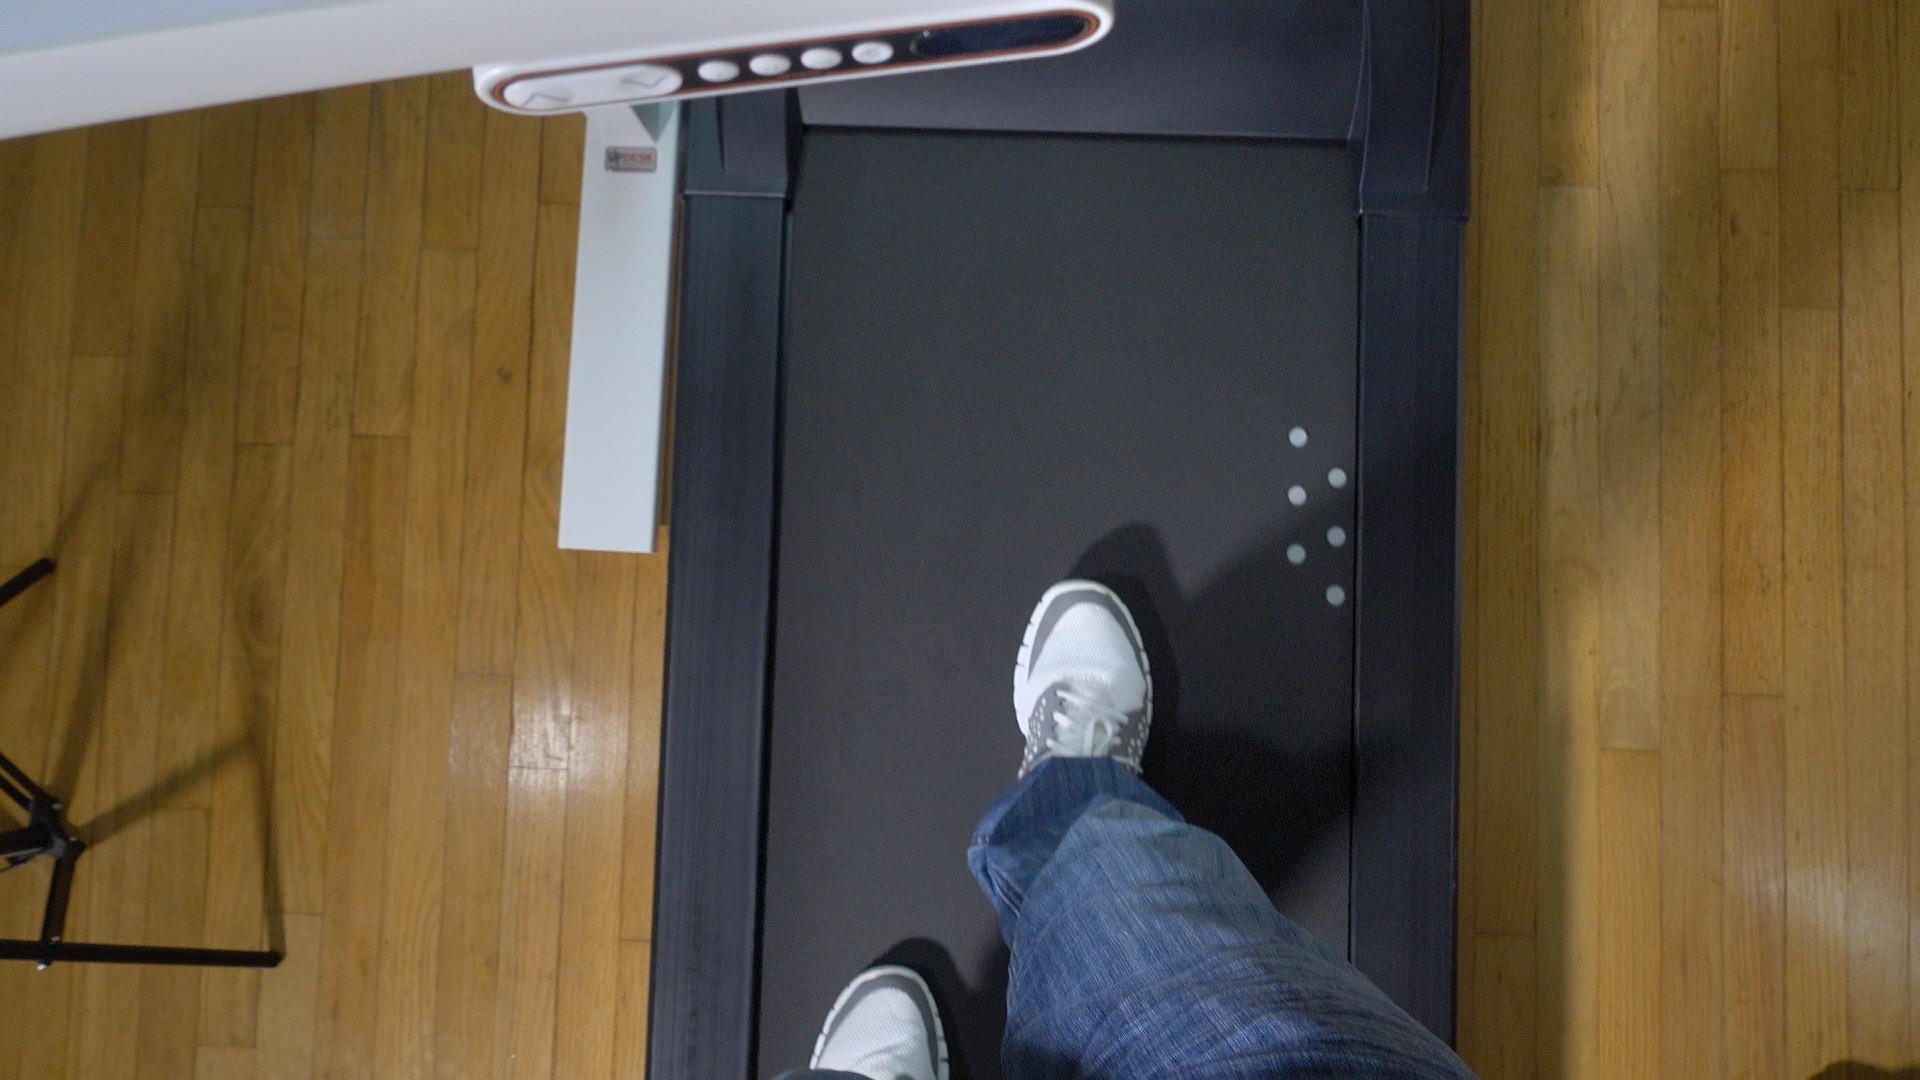 LifeSpan Treadmill Standing Desk